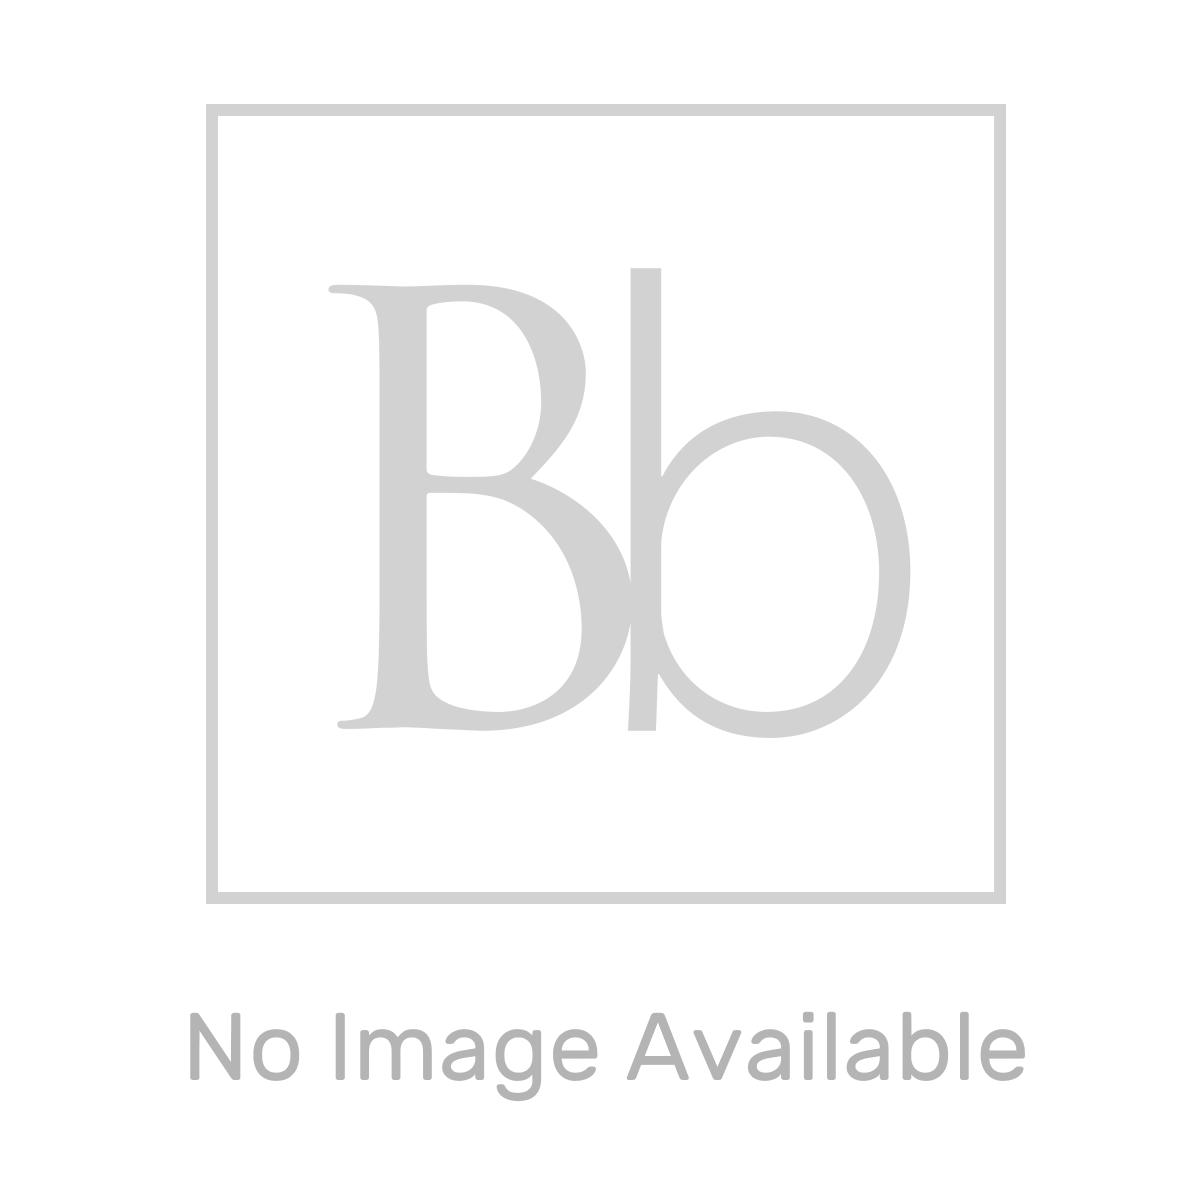 Nuie Athena Stone Grey 2 Drawer Floor Standing Vanity Unit with 18mm Worktop 600mm Line Drawing